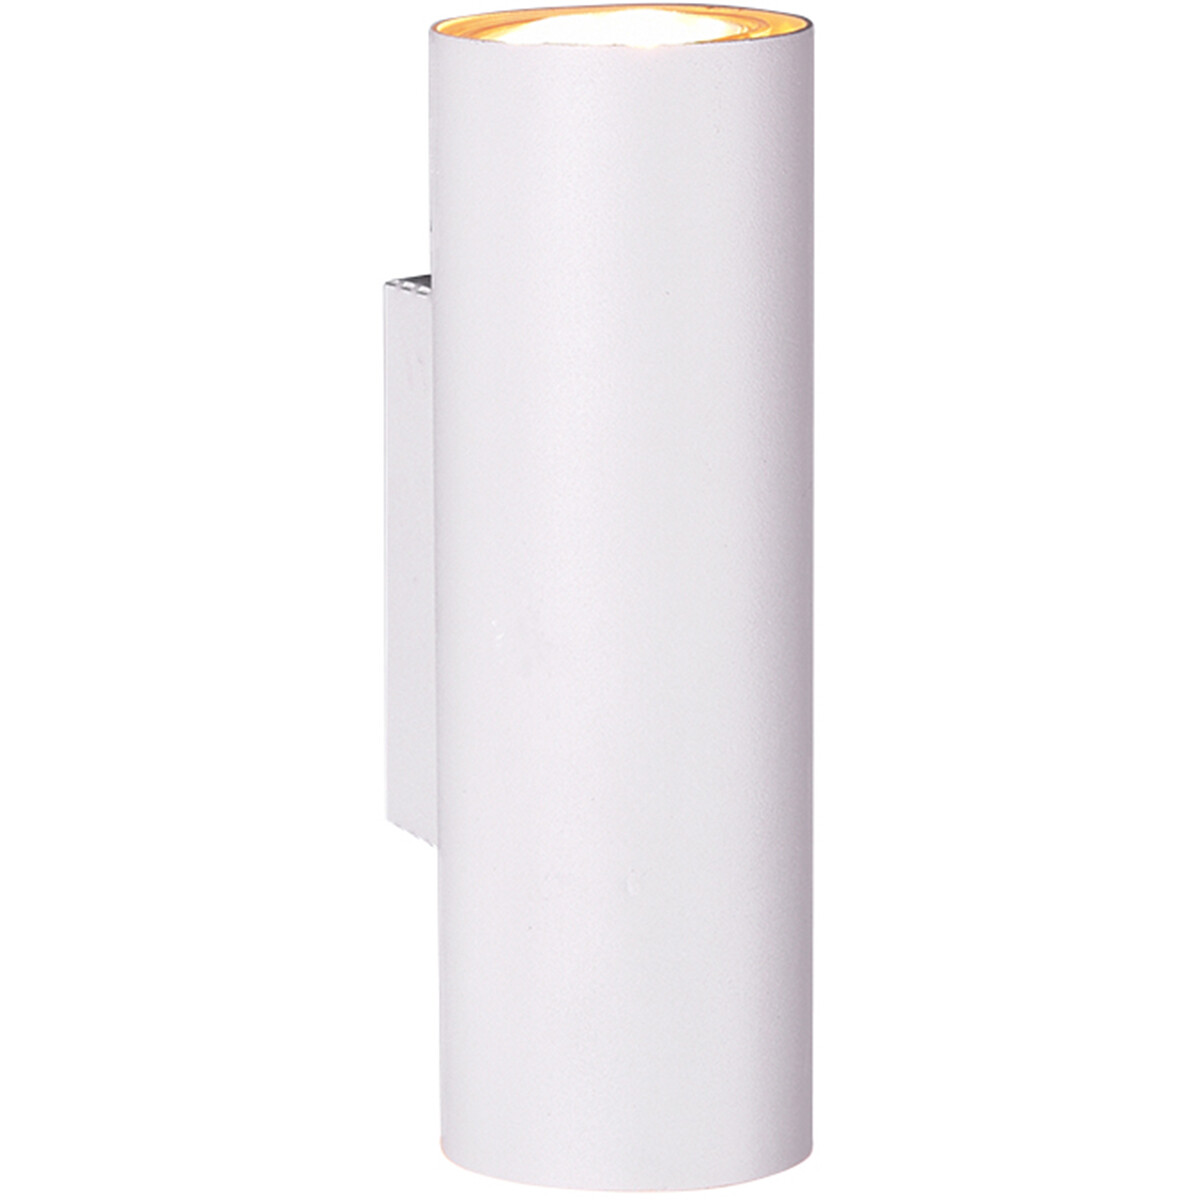 LED Wandlamp - Trion Mary - GU10 Fitting - Rond - Mat Wit - Aluminium